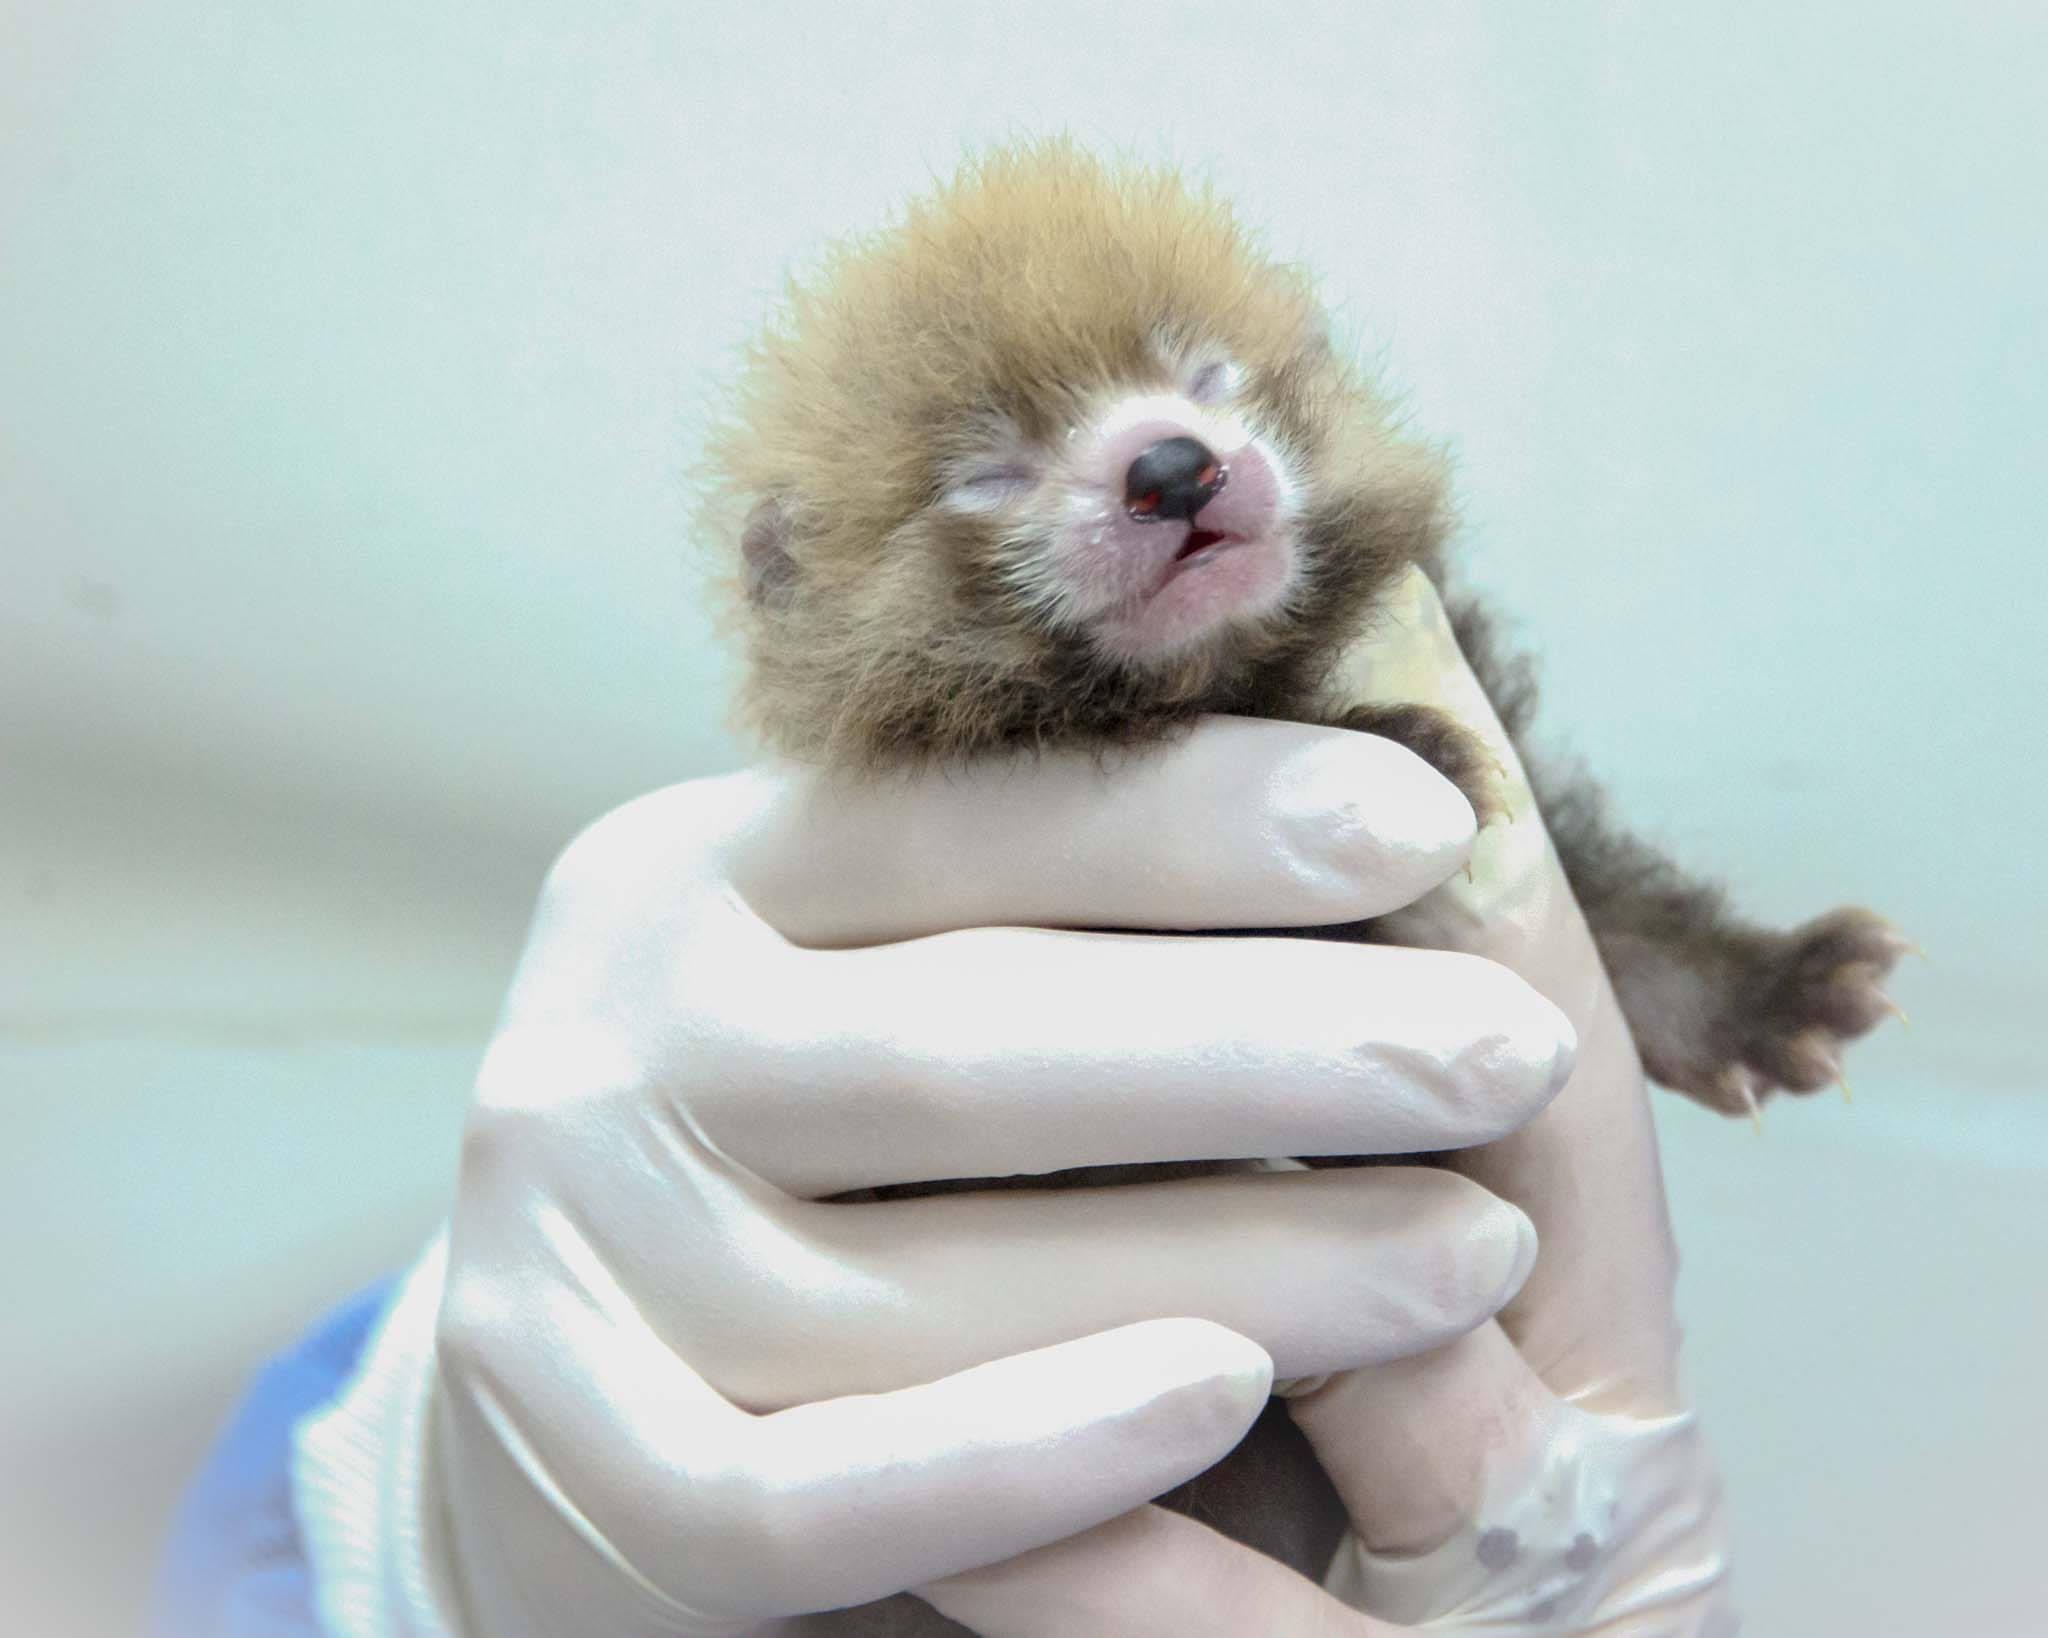 Four litters of red panda cubs born at Scbi